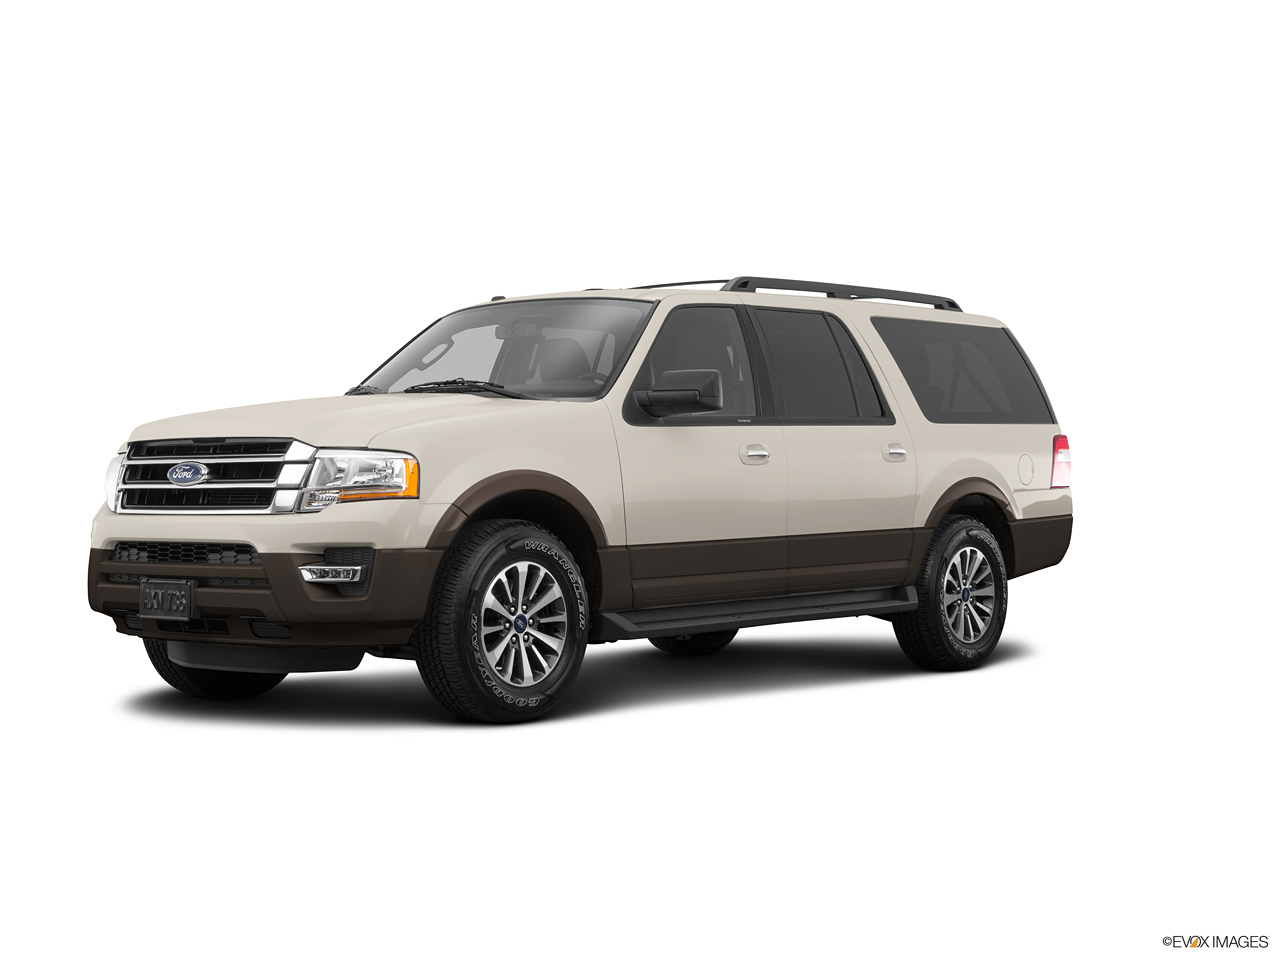 car pictures list for ford expedition el 2018 3 5l xlt saudi arabia yallamotor. Black Bedroom Furniture Sets. Home Design Ideas